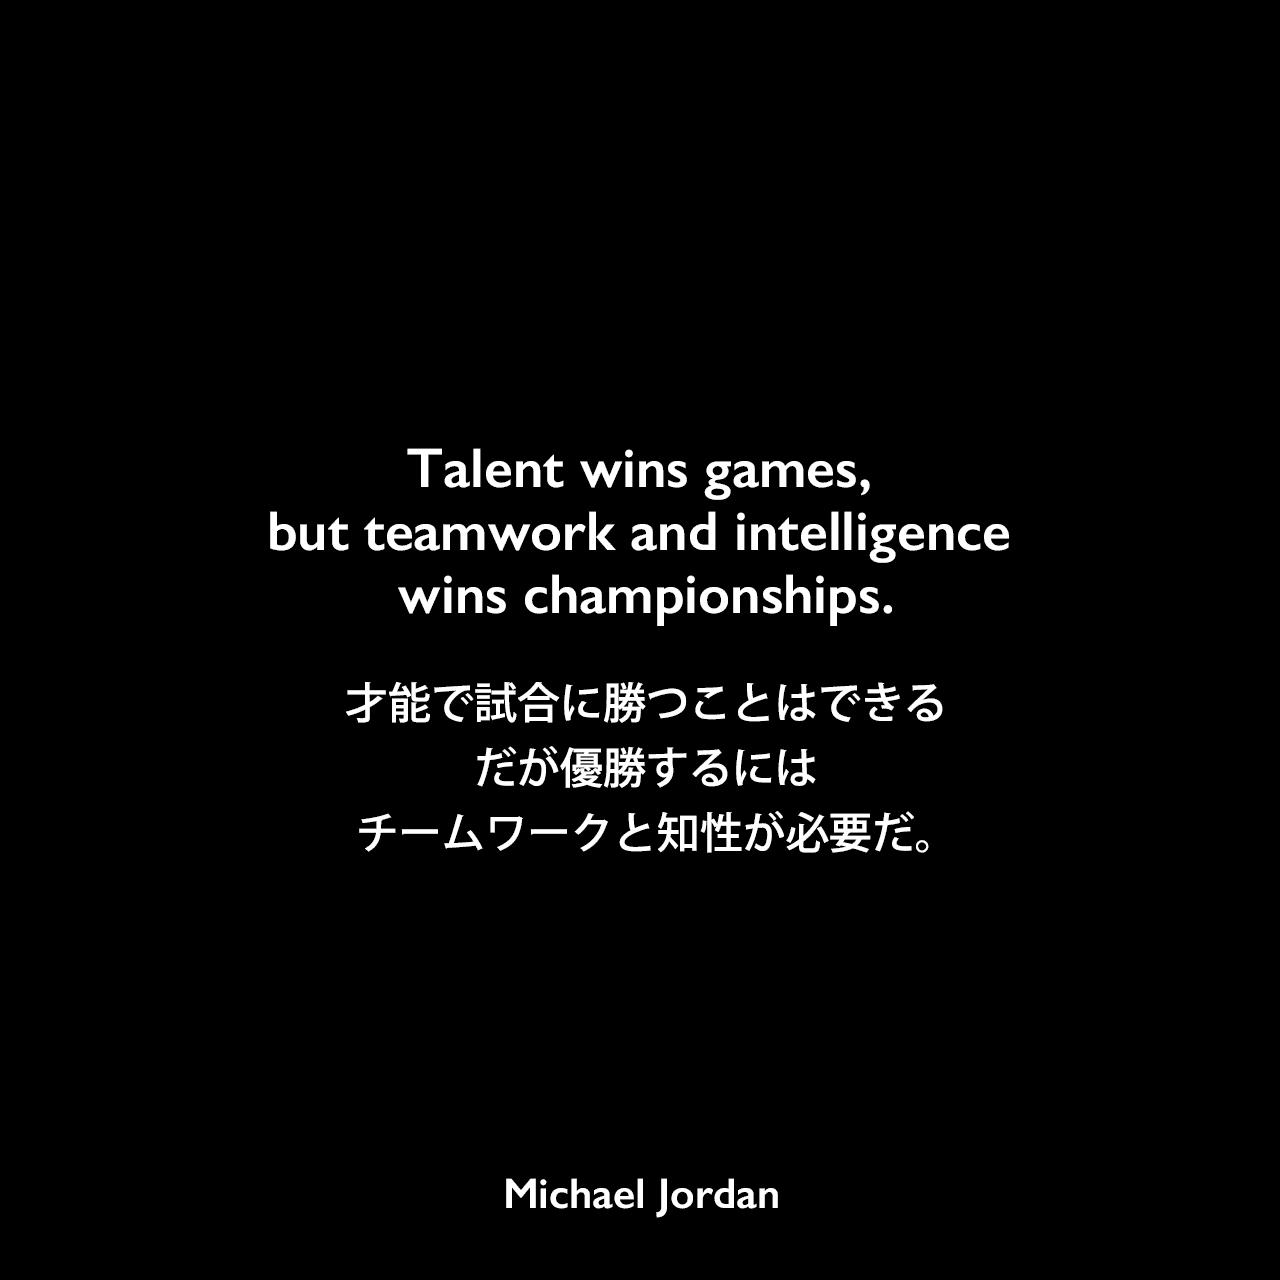 Talent wins games, but teamwork and intelligence wins championships.才能で試合に勝つことはできる、だが優勝するには、チームワークと知性が必要だ。